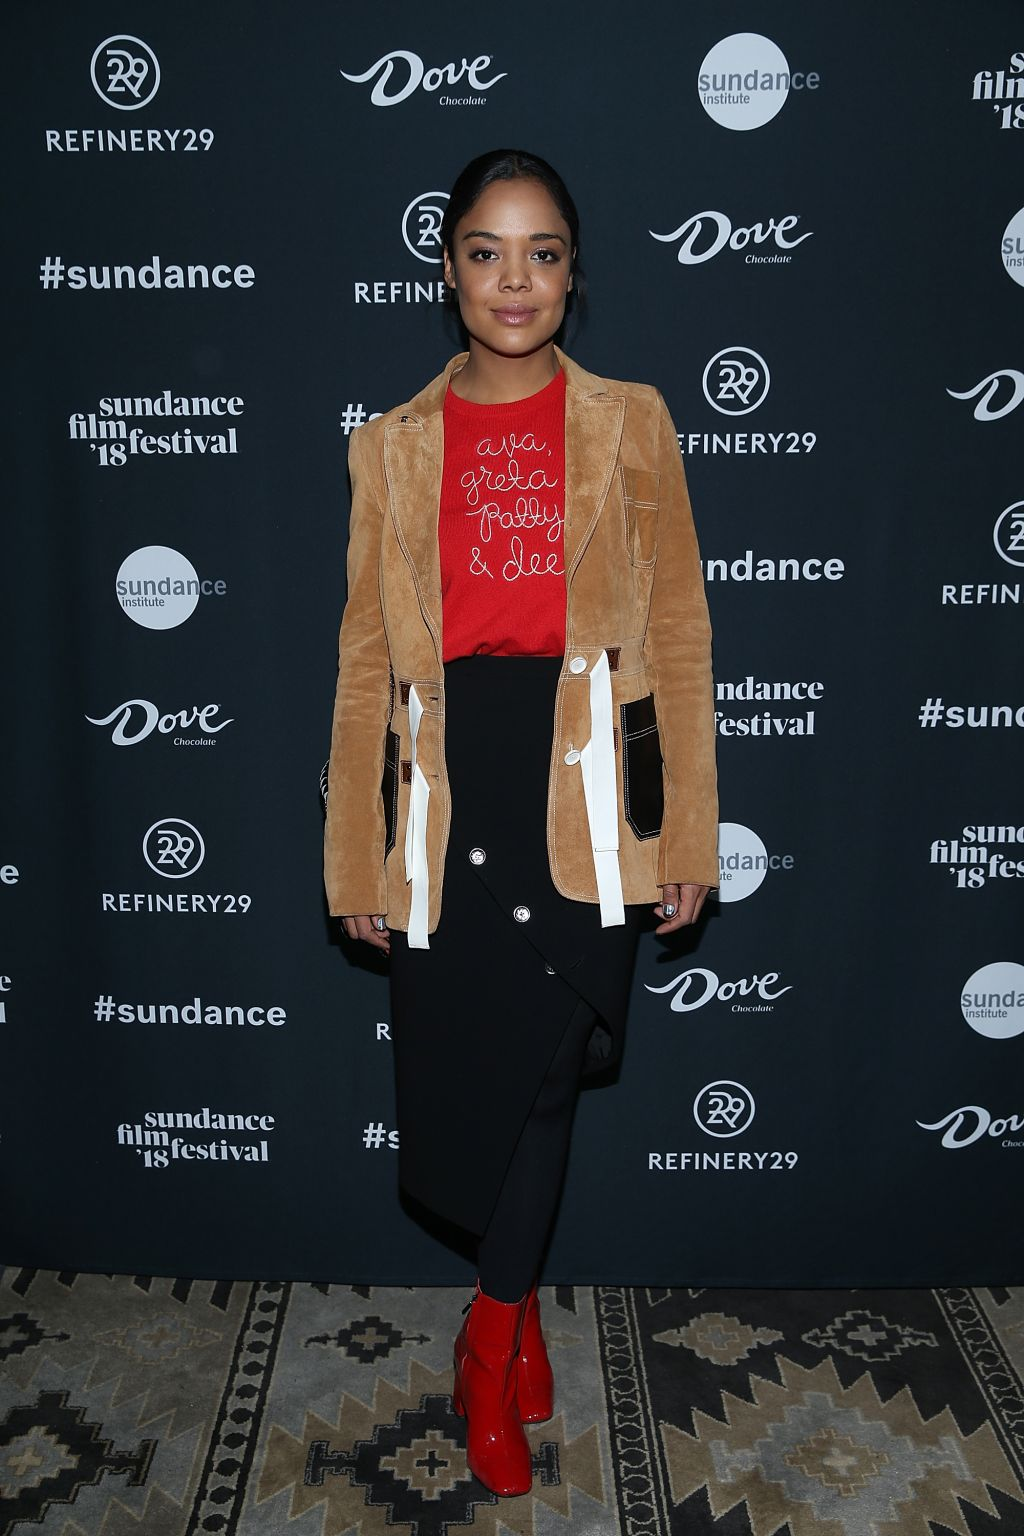 The Sundance Institute, Refinery29, and DOVE Chocolate Present 2018 Women at Sundance Brunch